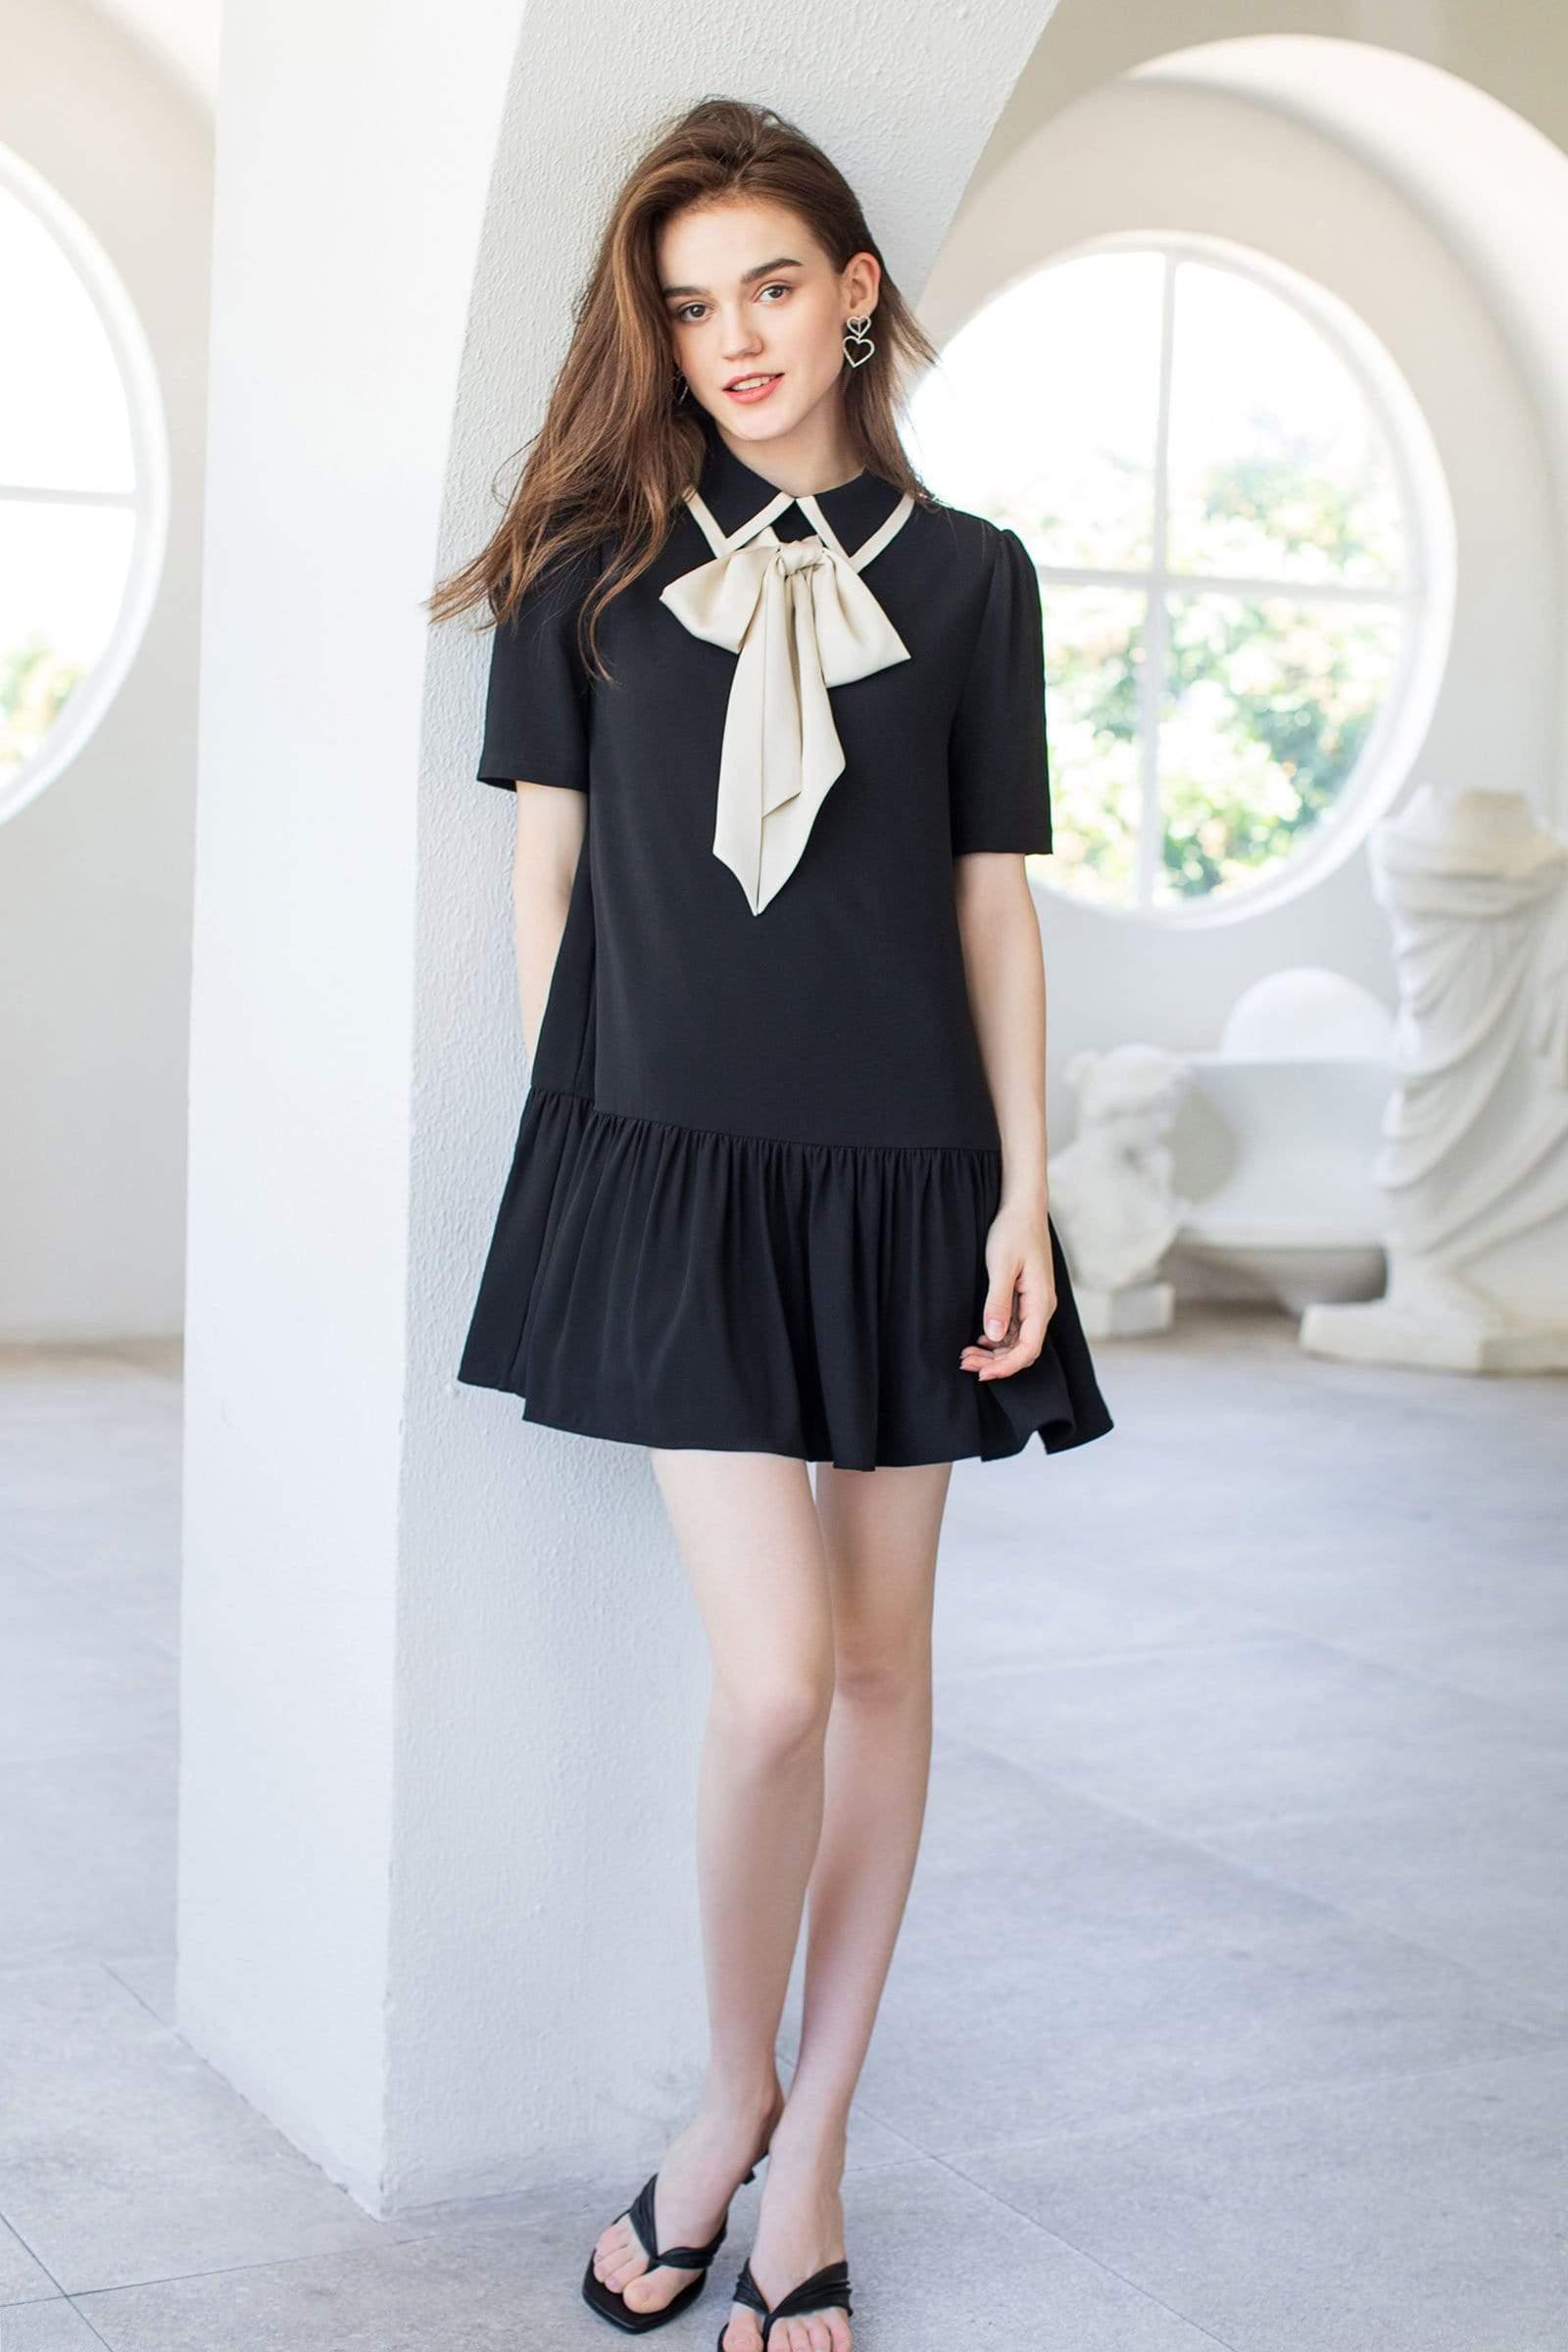 Wednesday Black Bow Dress